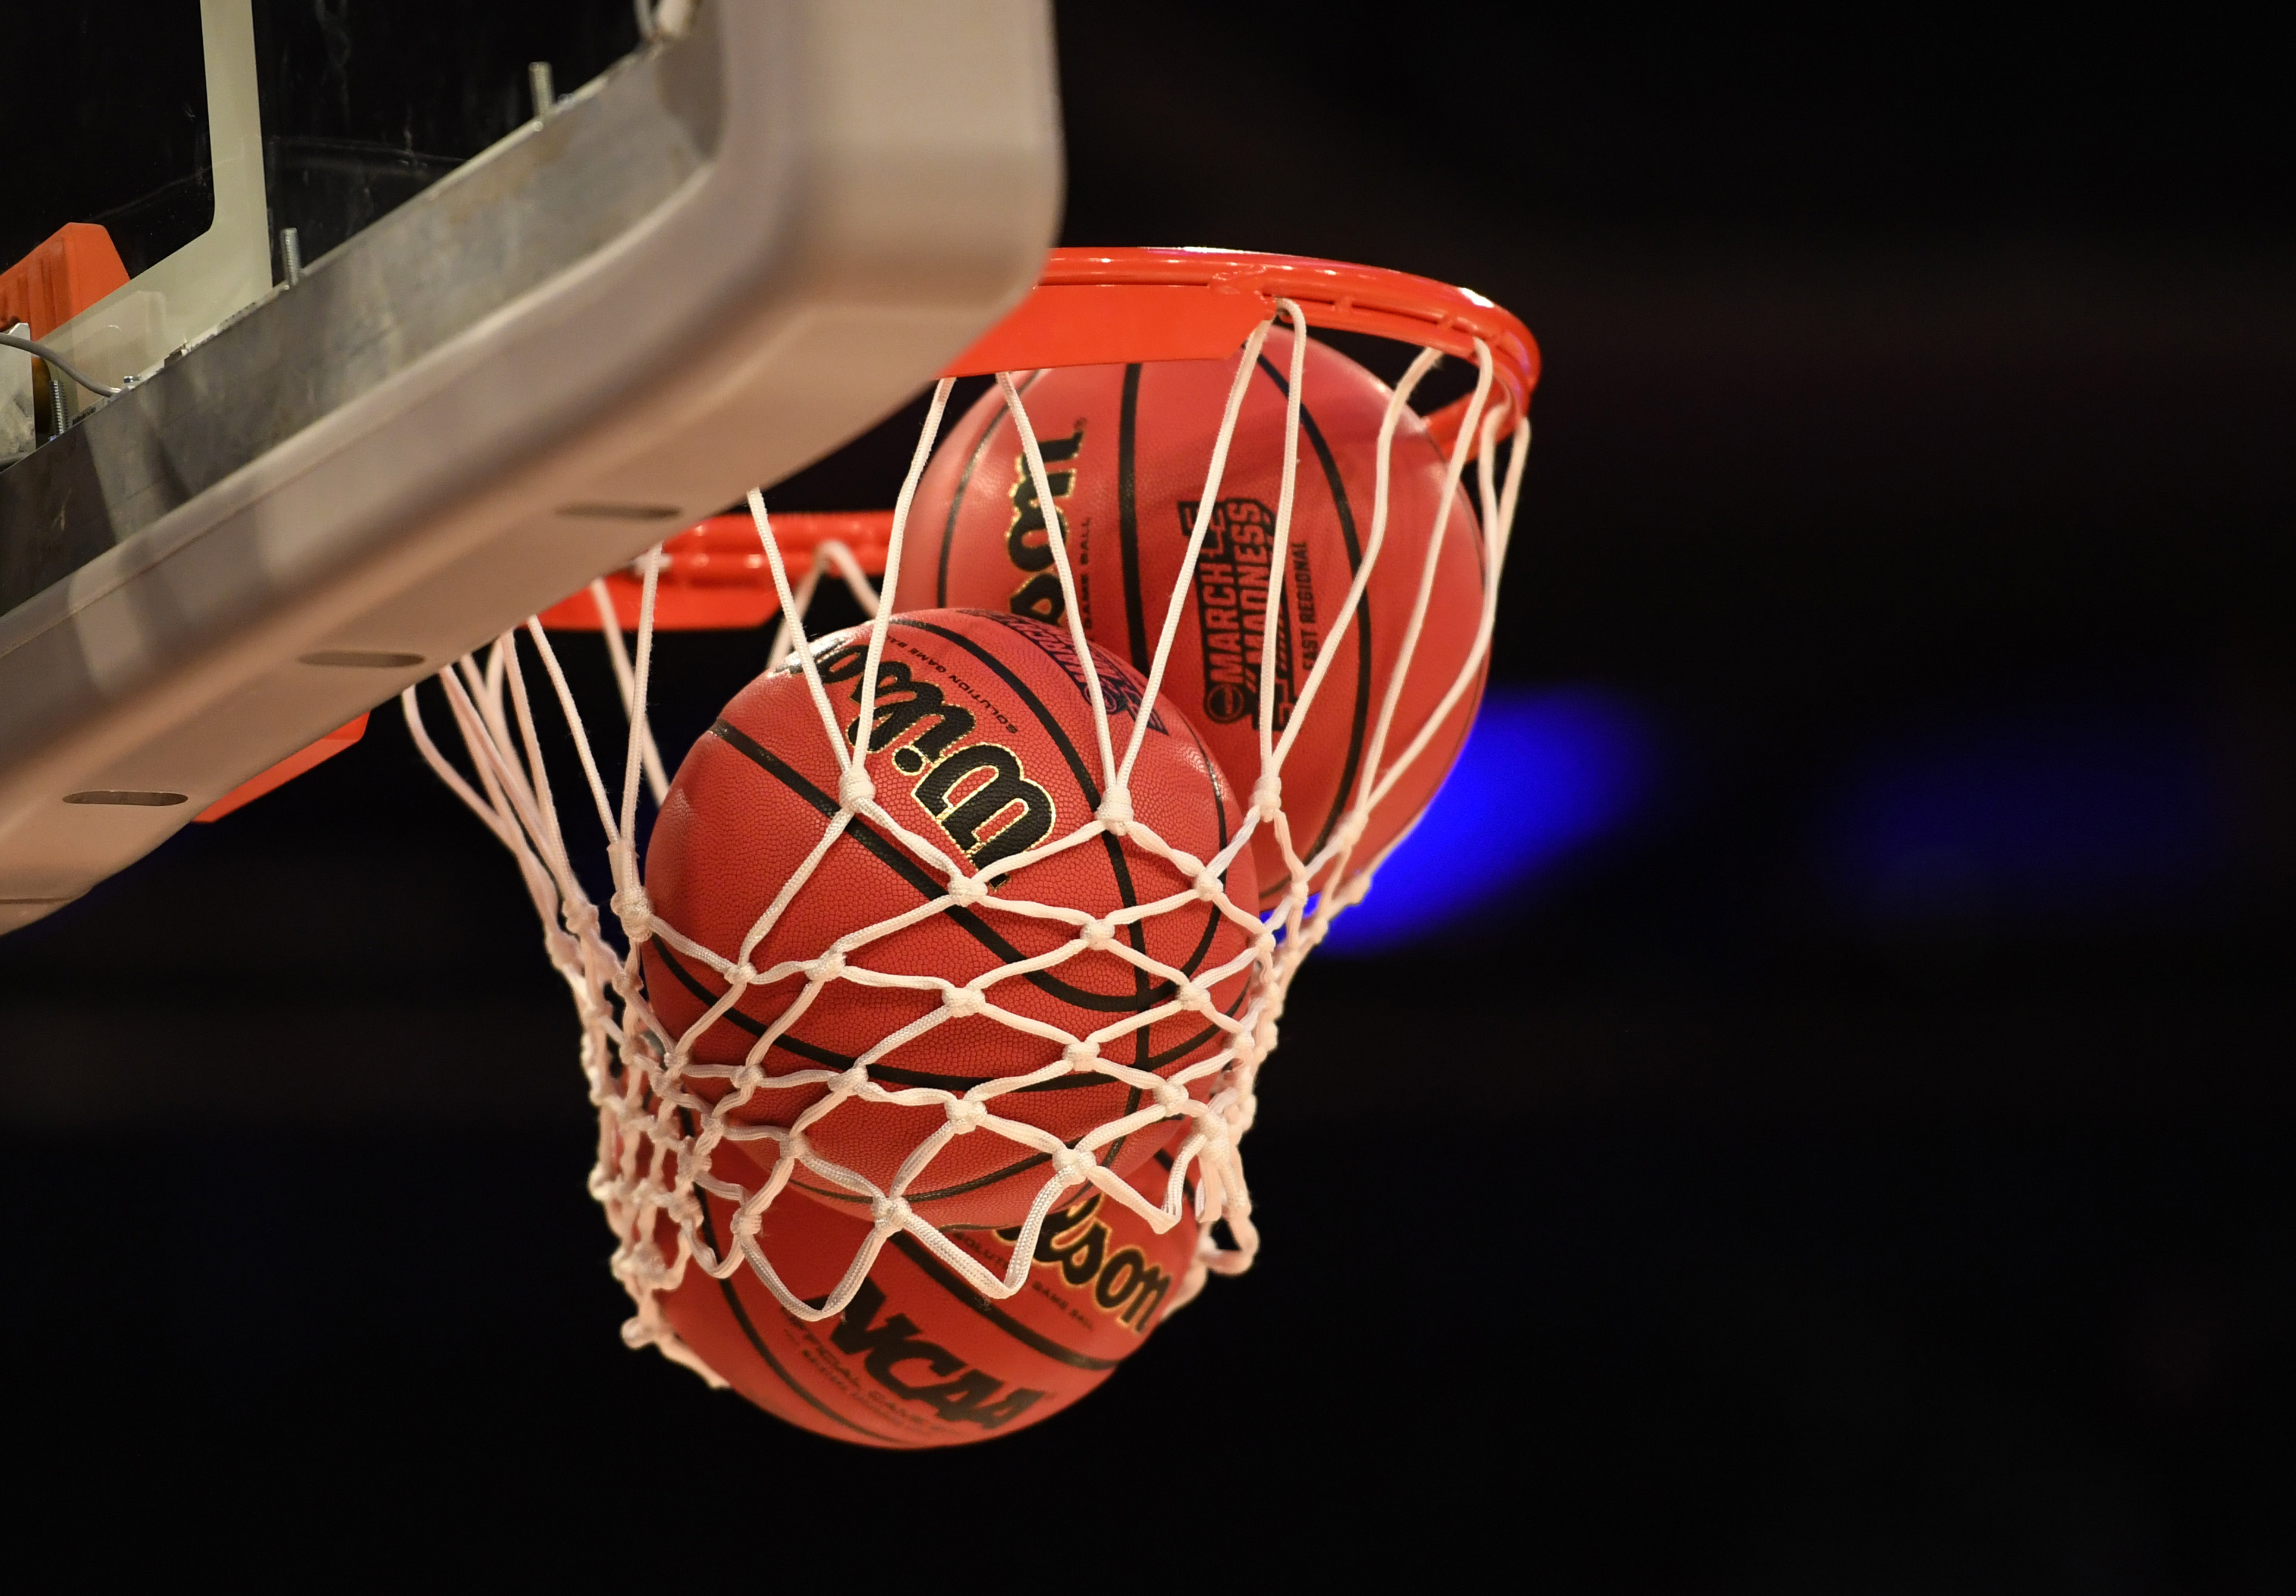 9965999-ncaa-basketball-ncaa-tournament-east-regional-practice